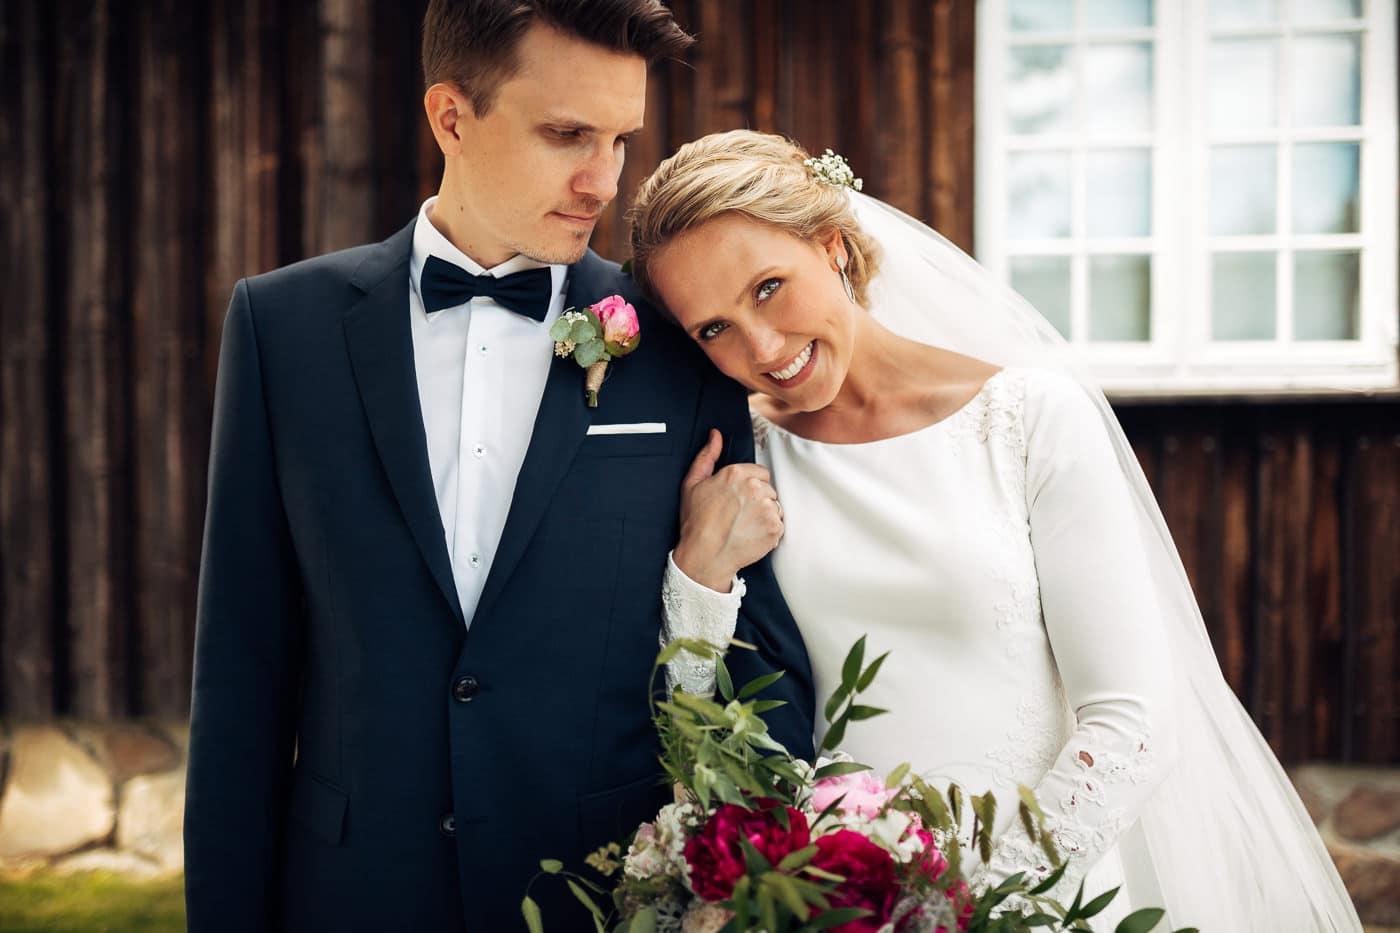 Karoline & Andreas - bryllup i Østfold med magiske detaljer Bryllup Fredrikstad Fotograf 35